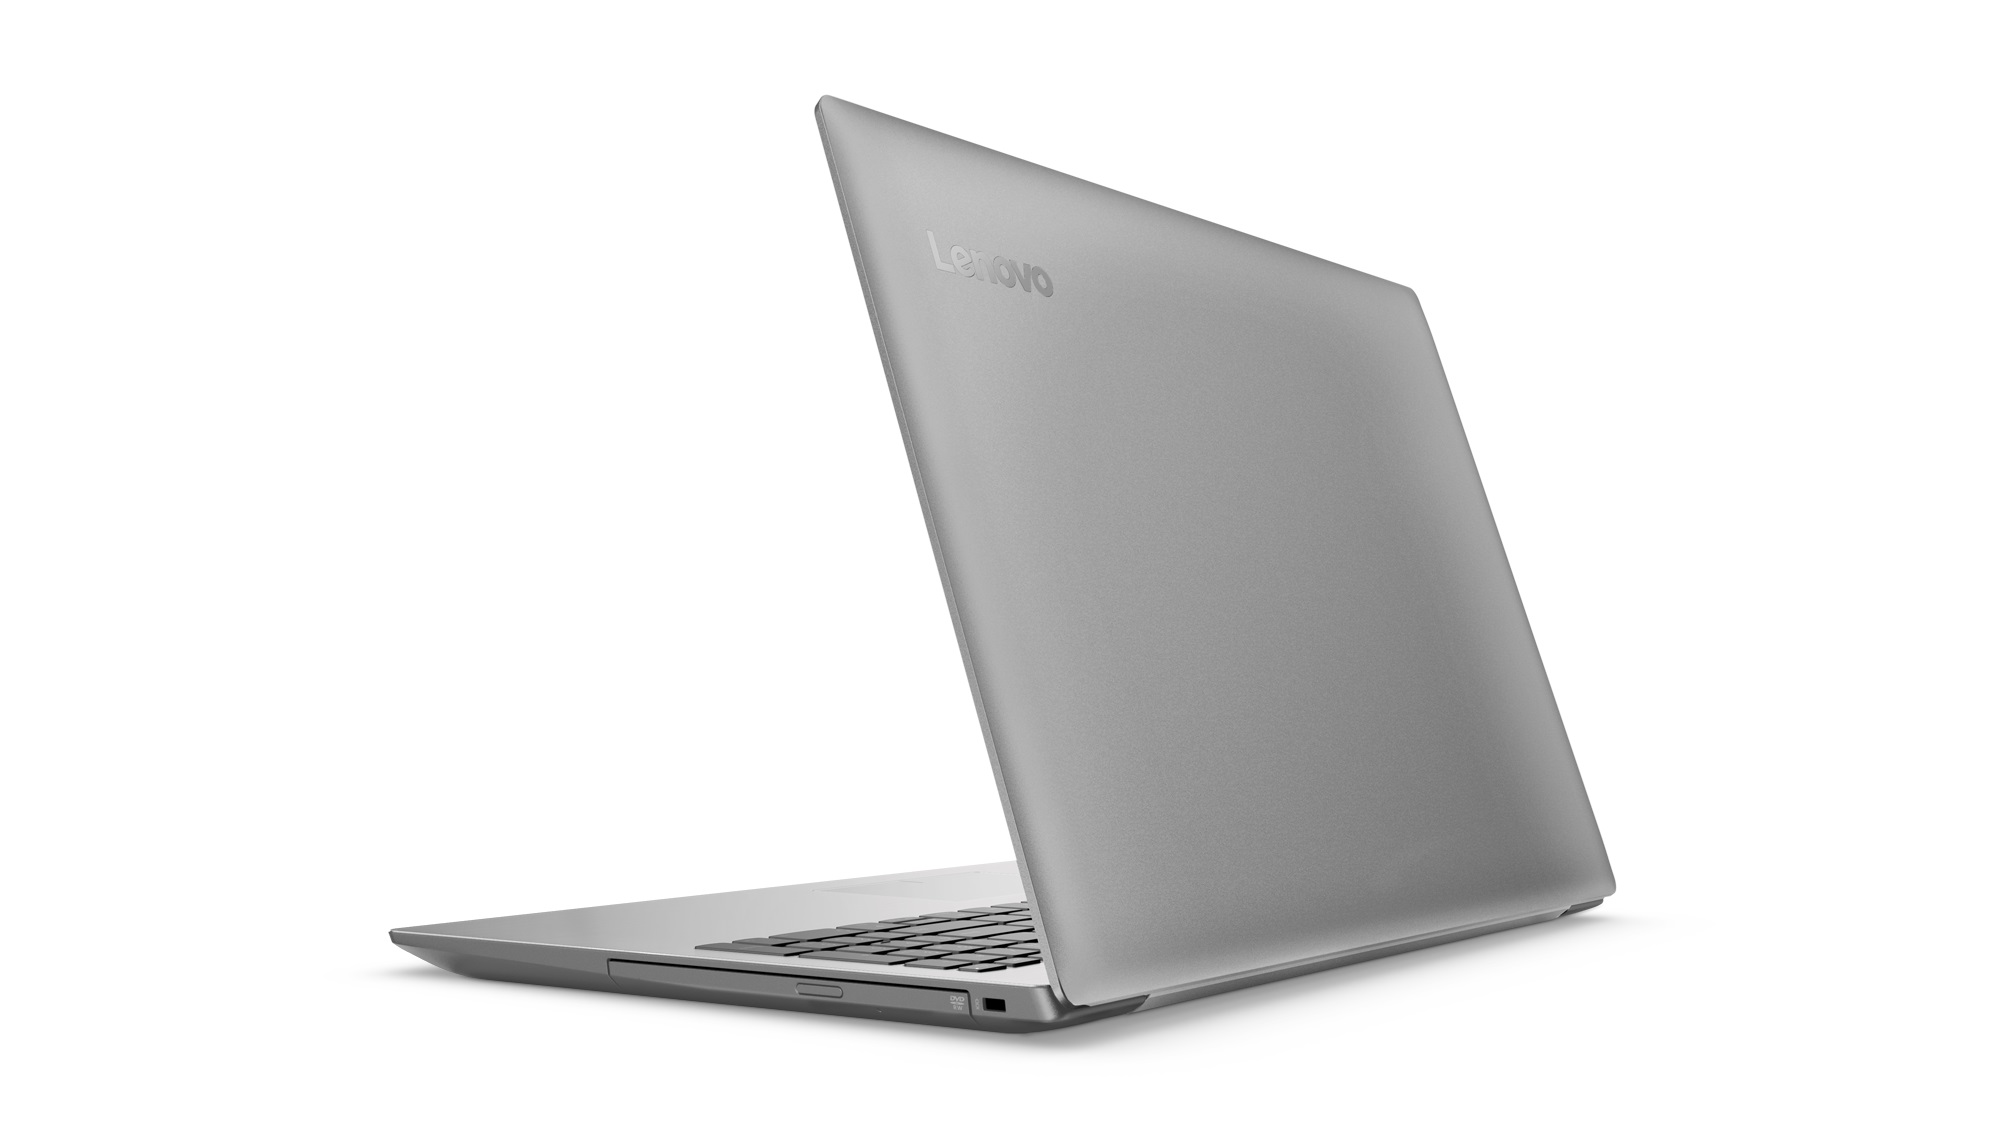 Фото  Ноутбук Lenovo ideapad 320-15IKB Platinum Grey (81BG00VGRA)